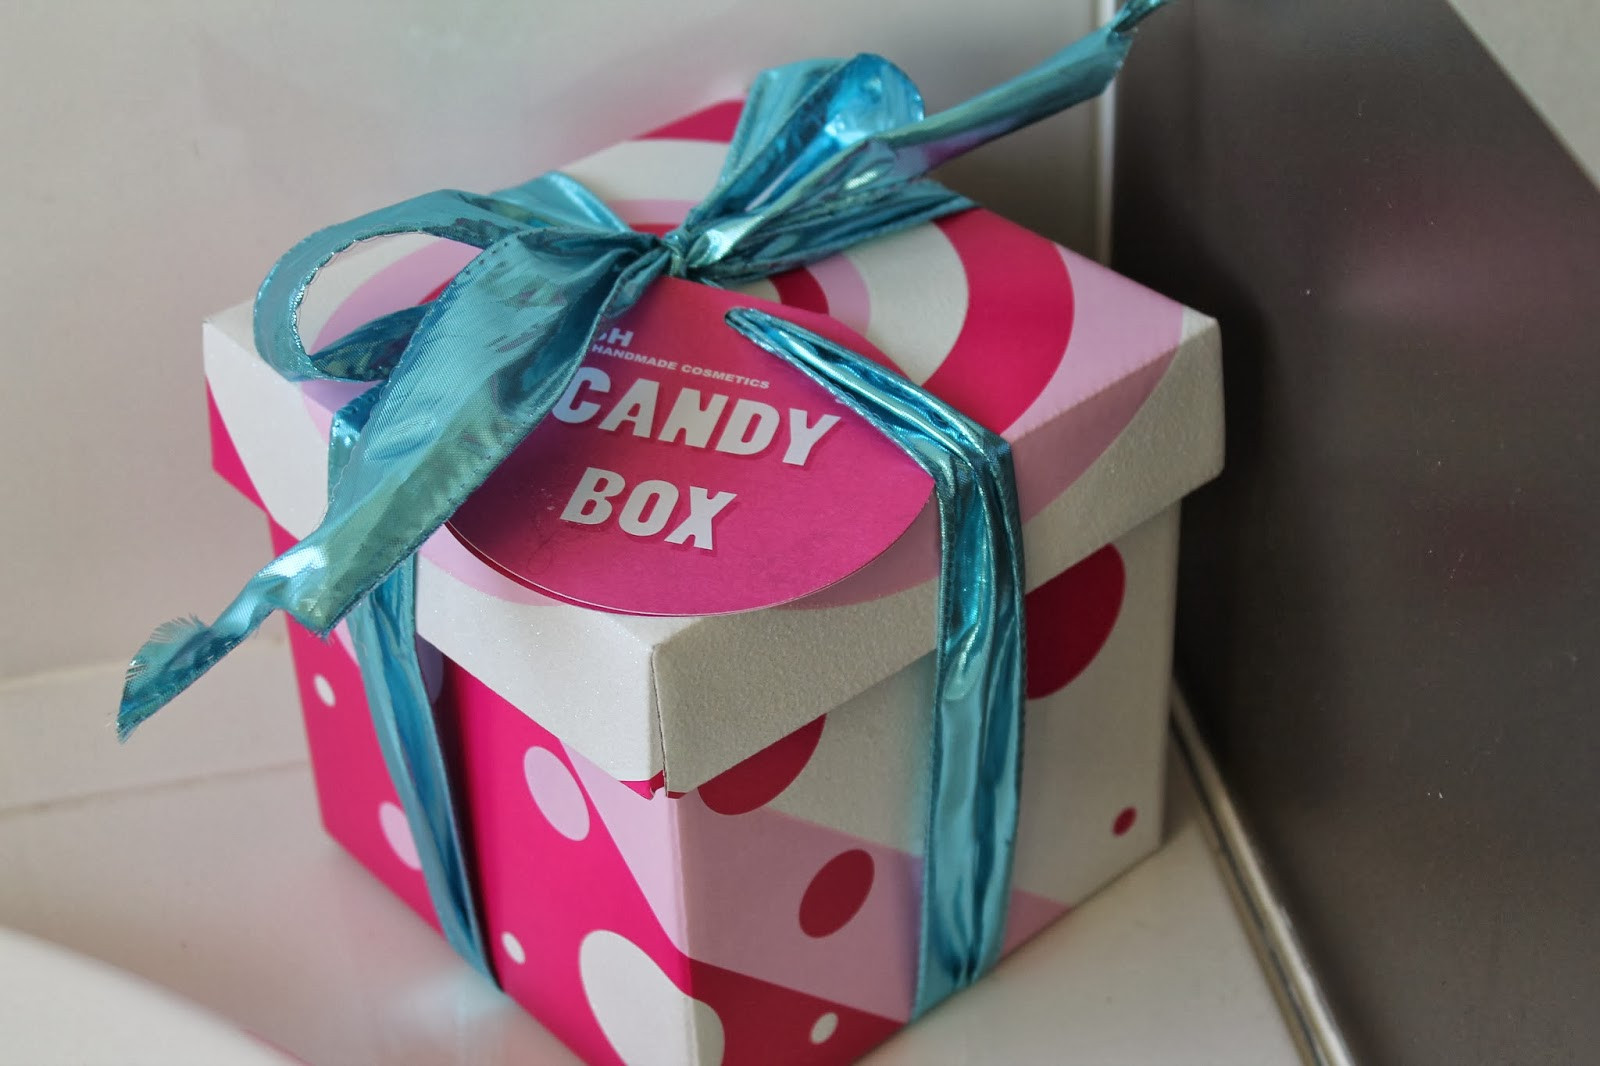 Christmas Candy Boxes  xobeautyheartxo Review Lush Christmas Candy Box